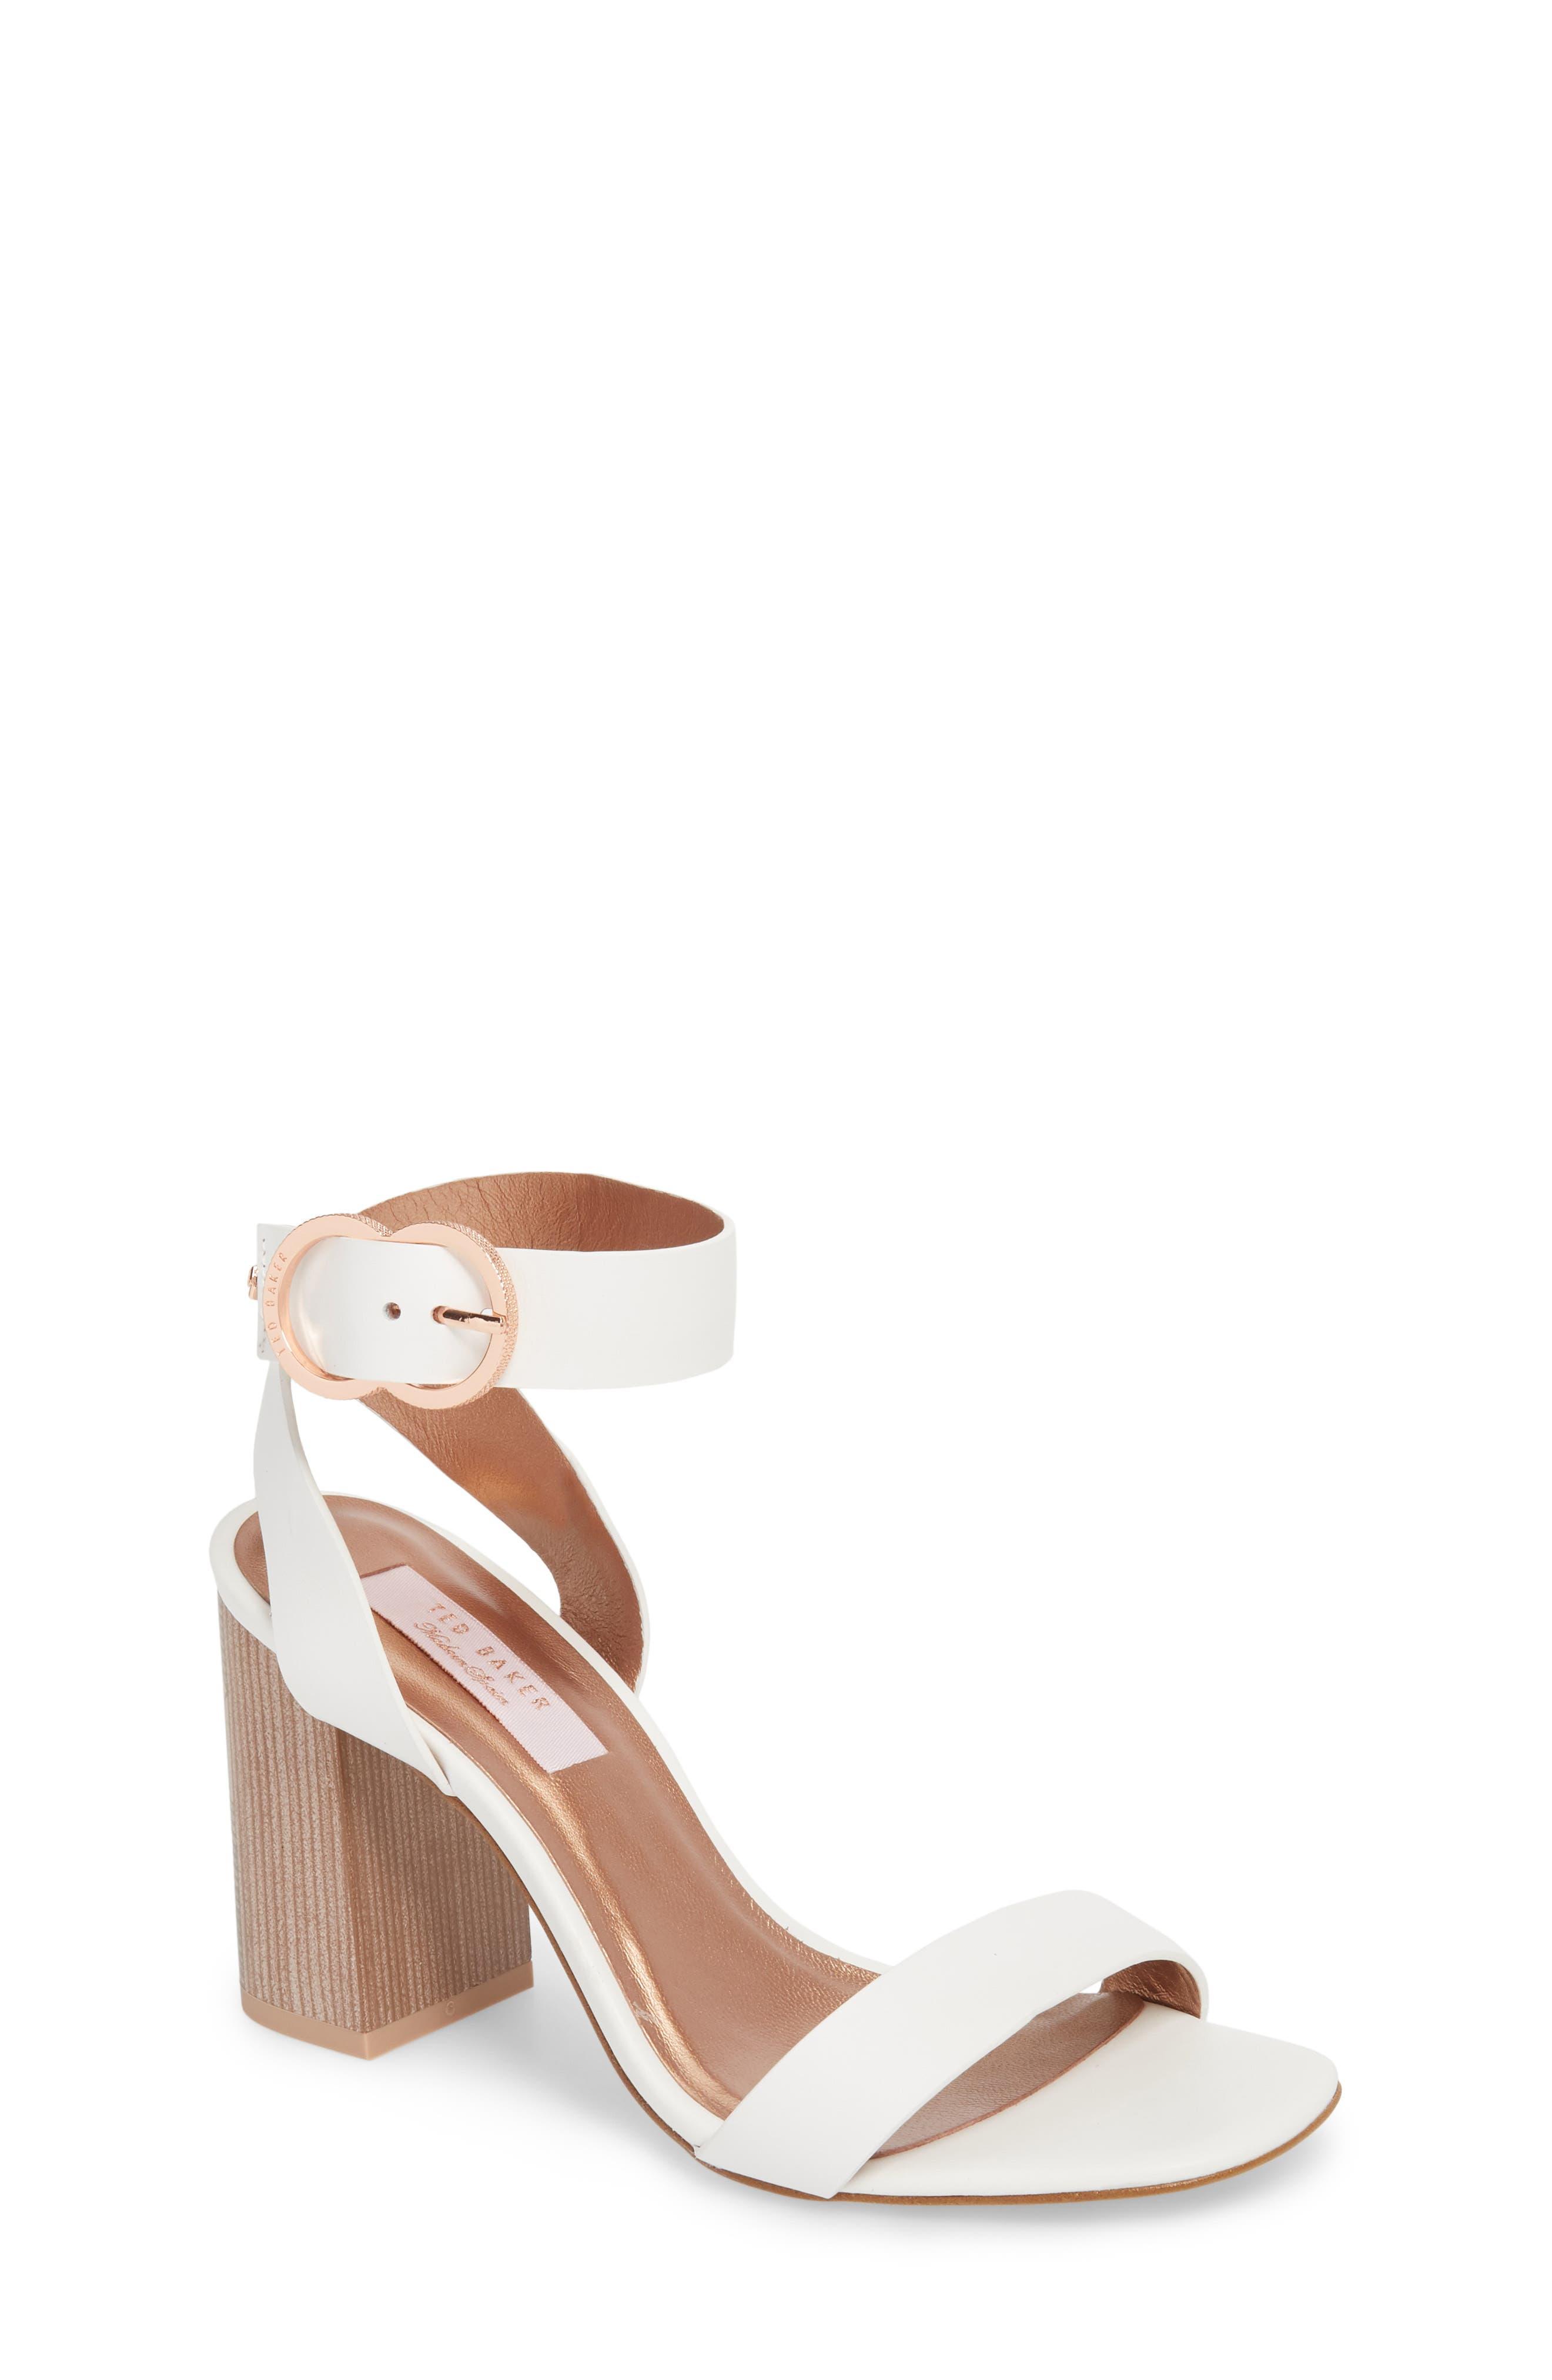 Vallama Block Heel Sandal,                             Main thumbnail 1, color,                             White Leather